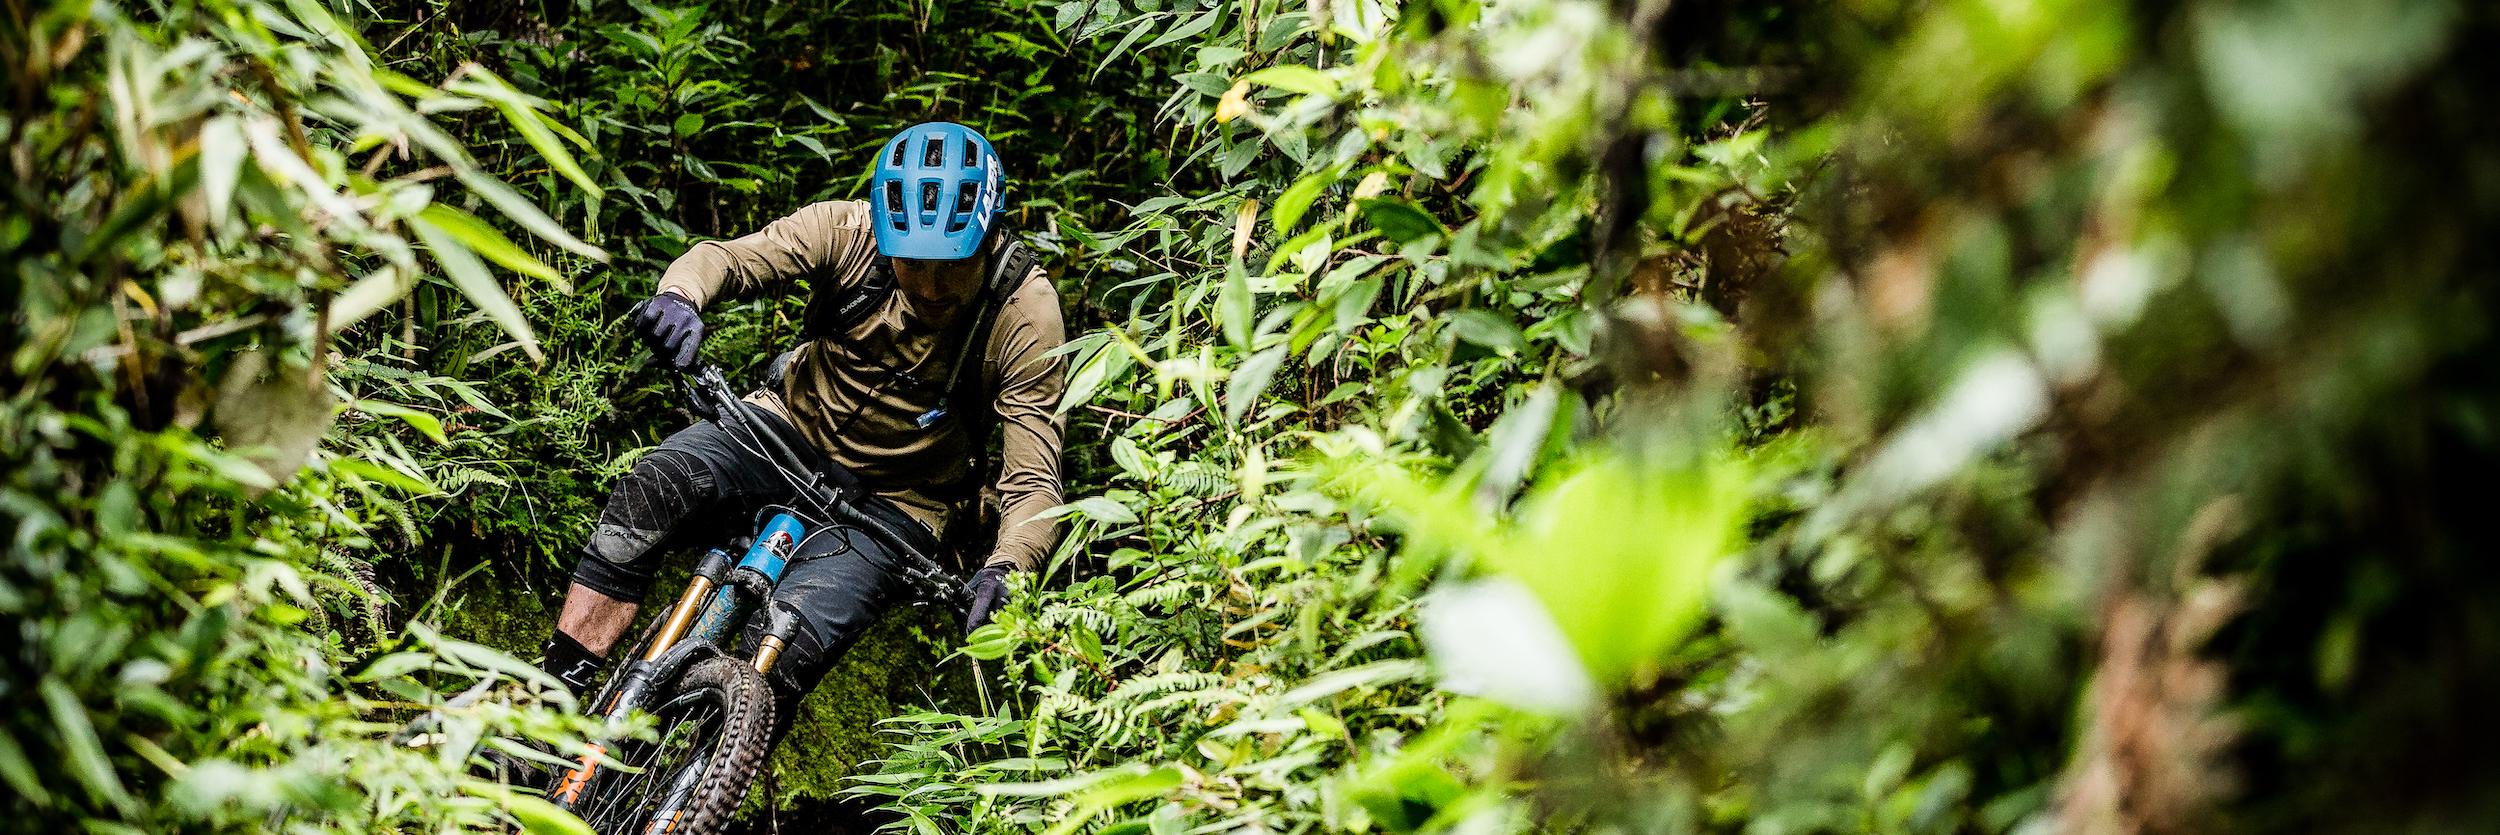 Mountain bike tours, riding through jungle in Ecuador